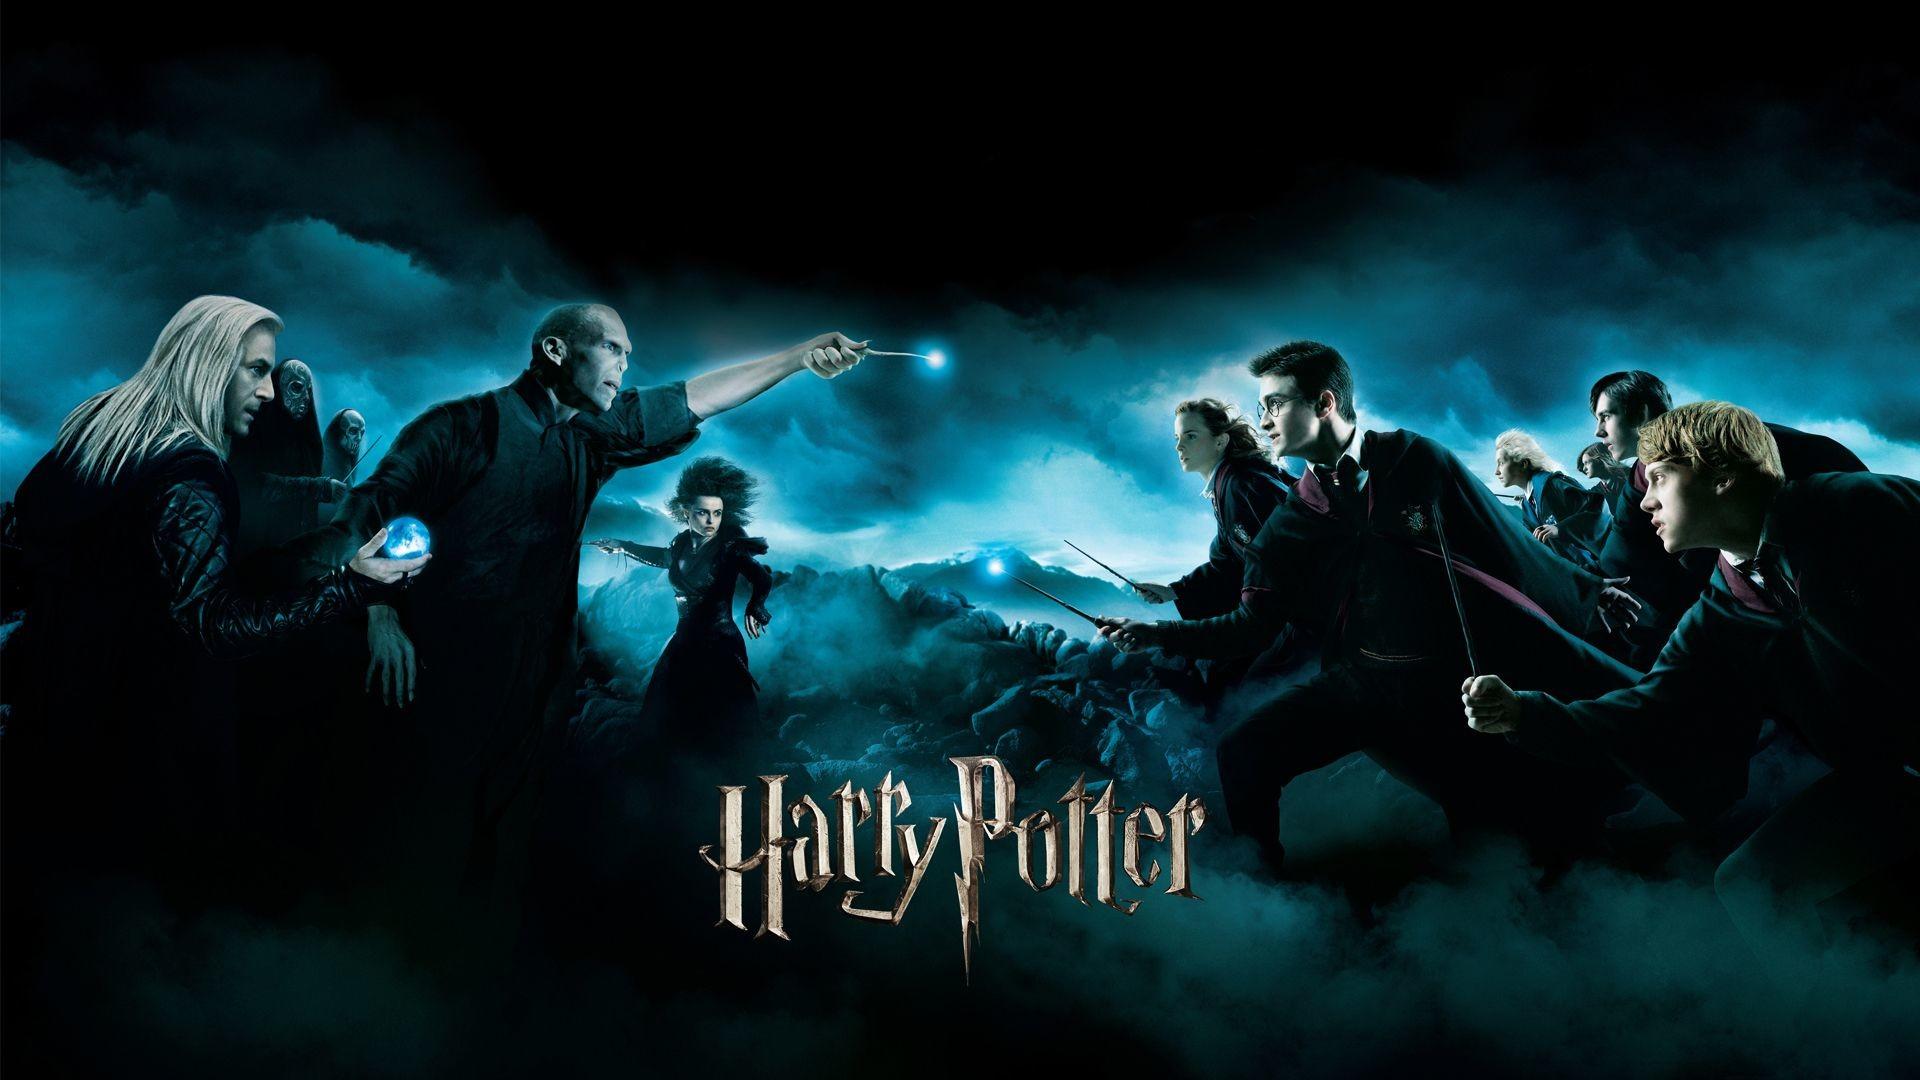 Harry Potter Wallpaper - Harry Potter Images 4k - HD Wallpaper